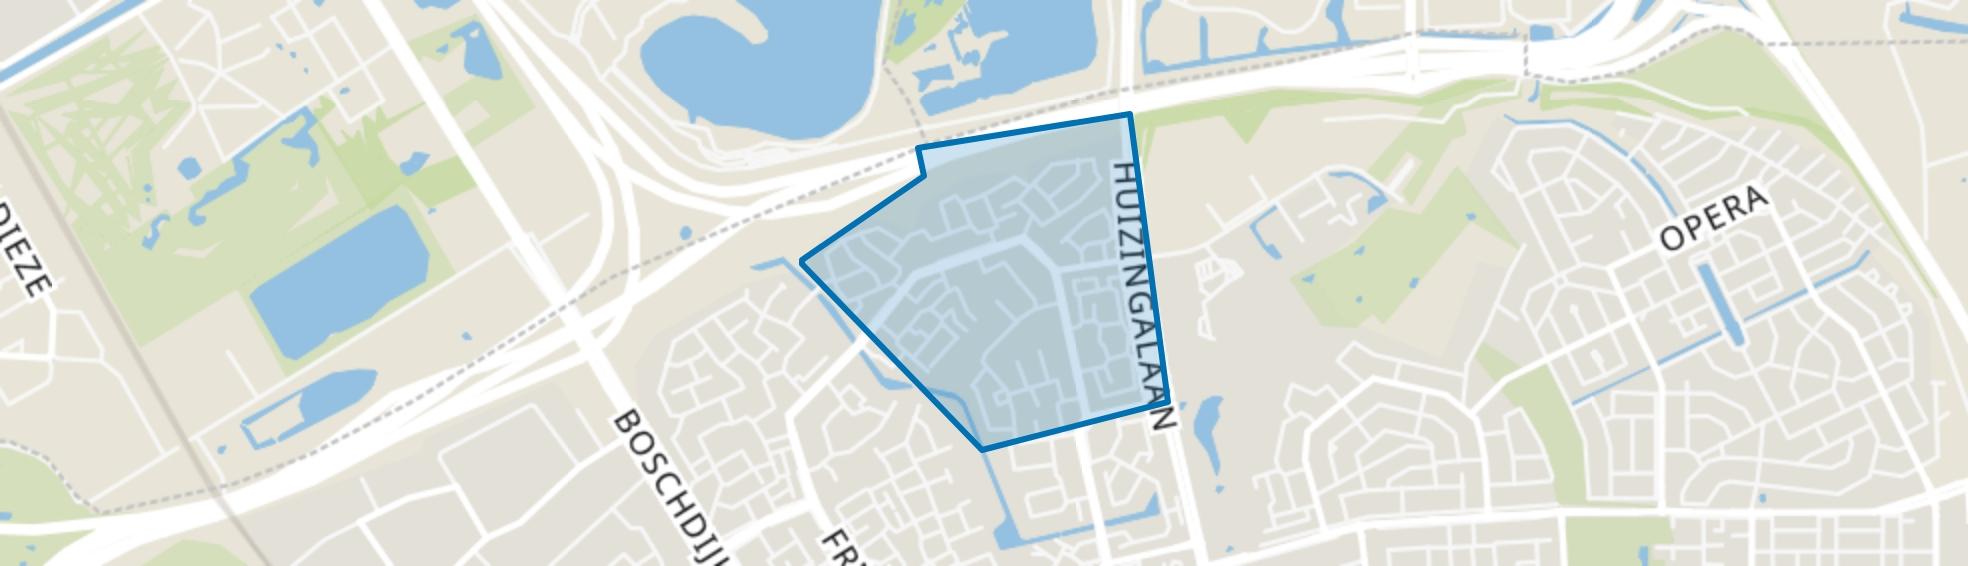 Achtse Barrier-Hoeven, Eindhoven map